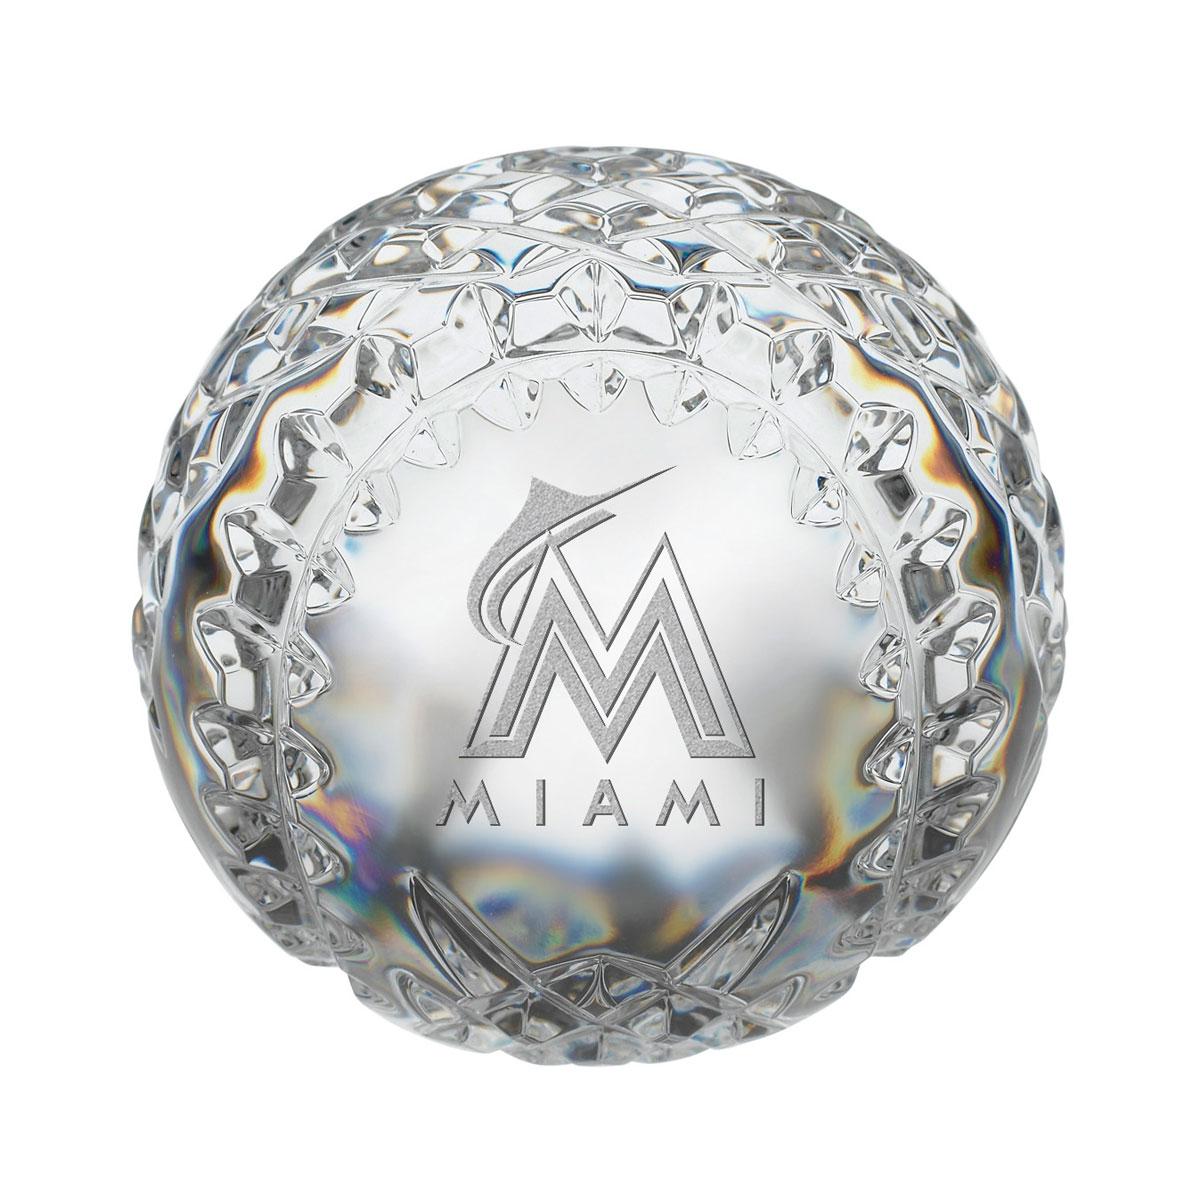 Waterford MLB Florida Marlins Crystal Baseball